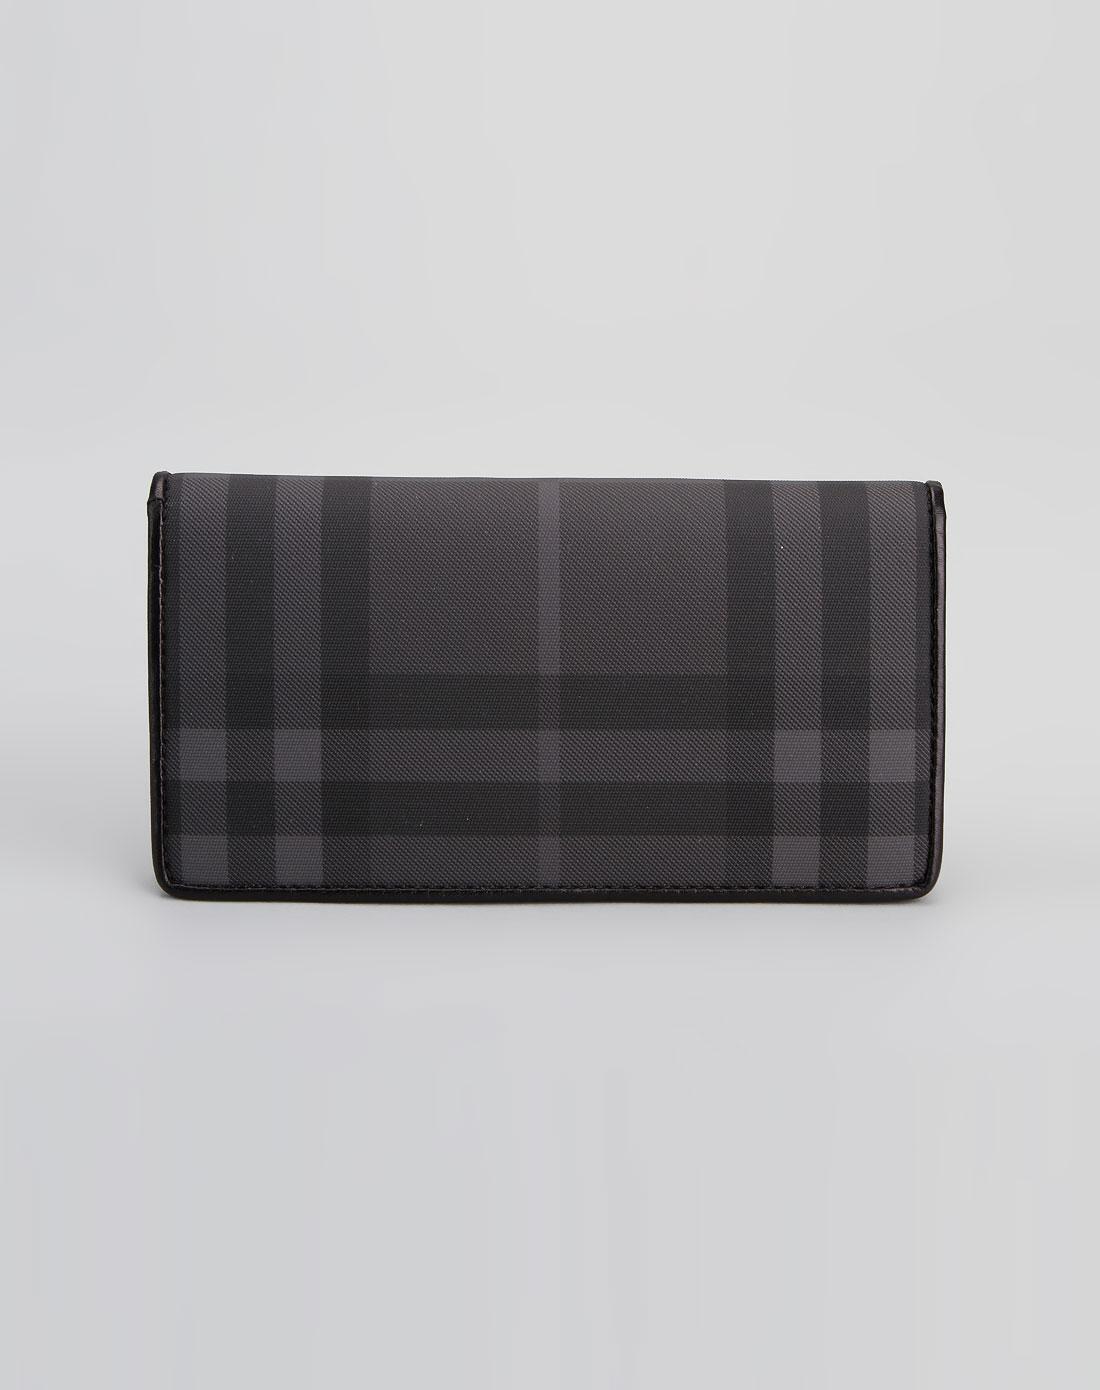 burberry包包专场 > 女款黑色格纹个性钱包